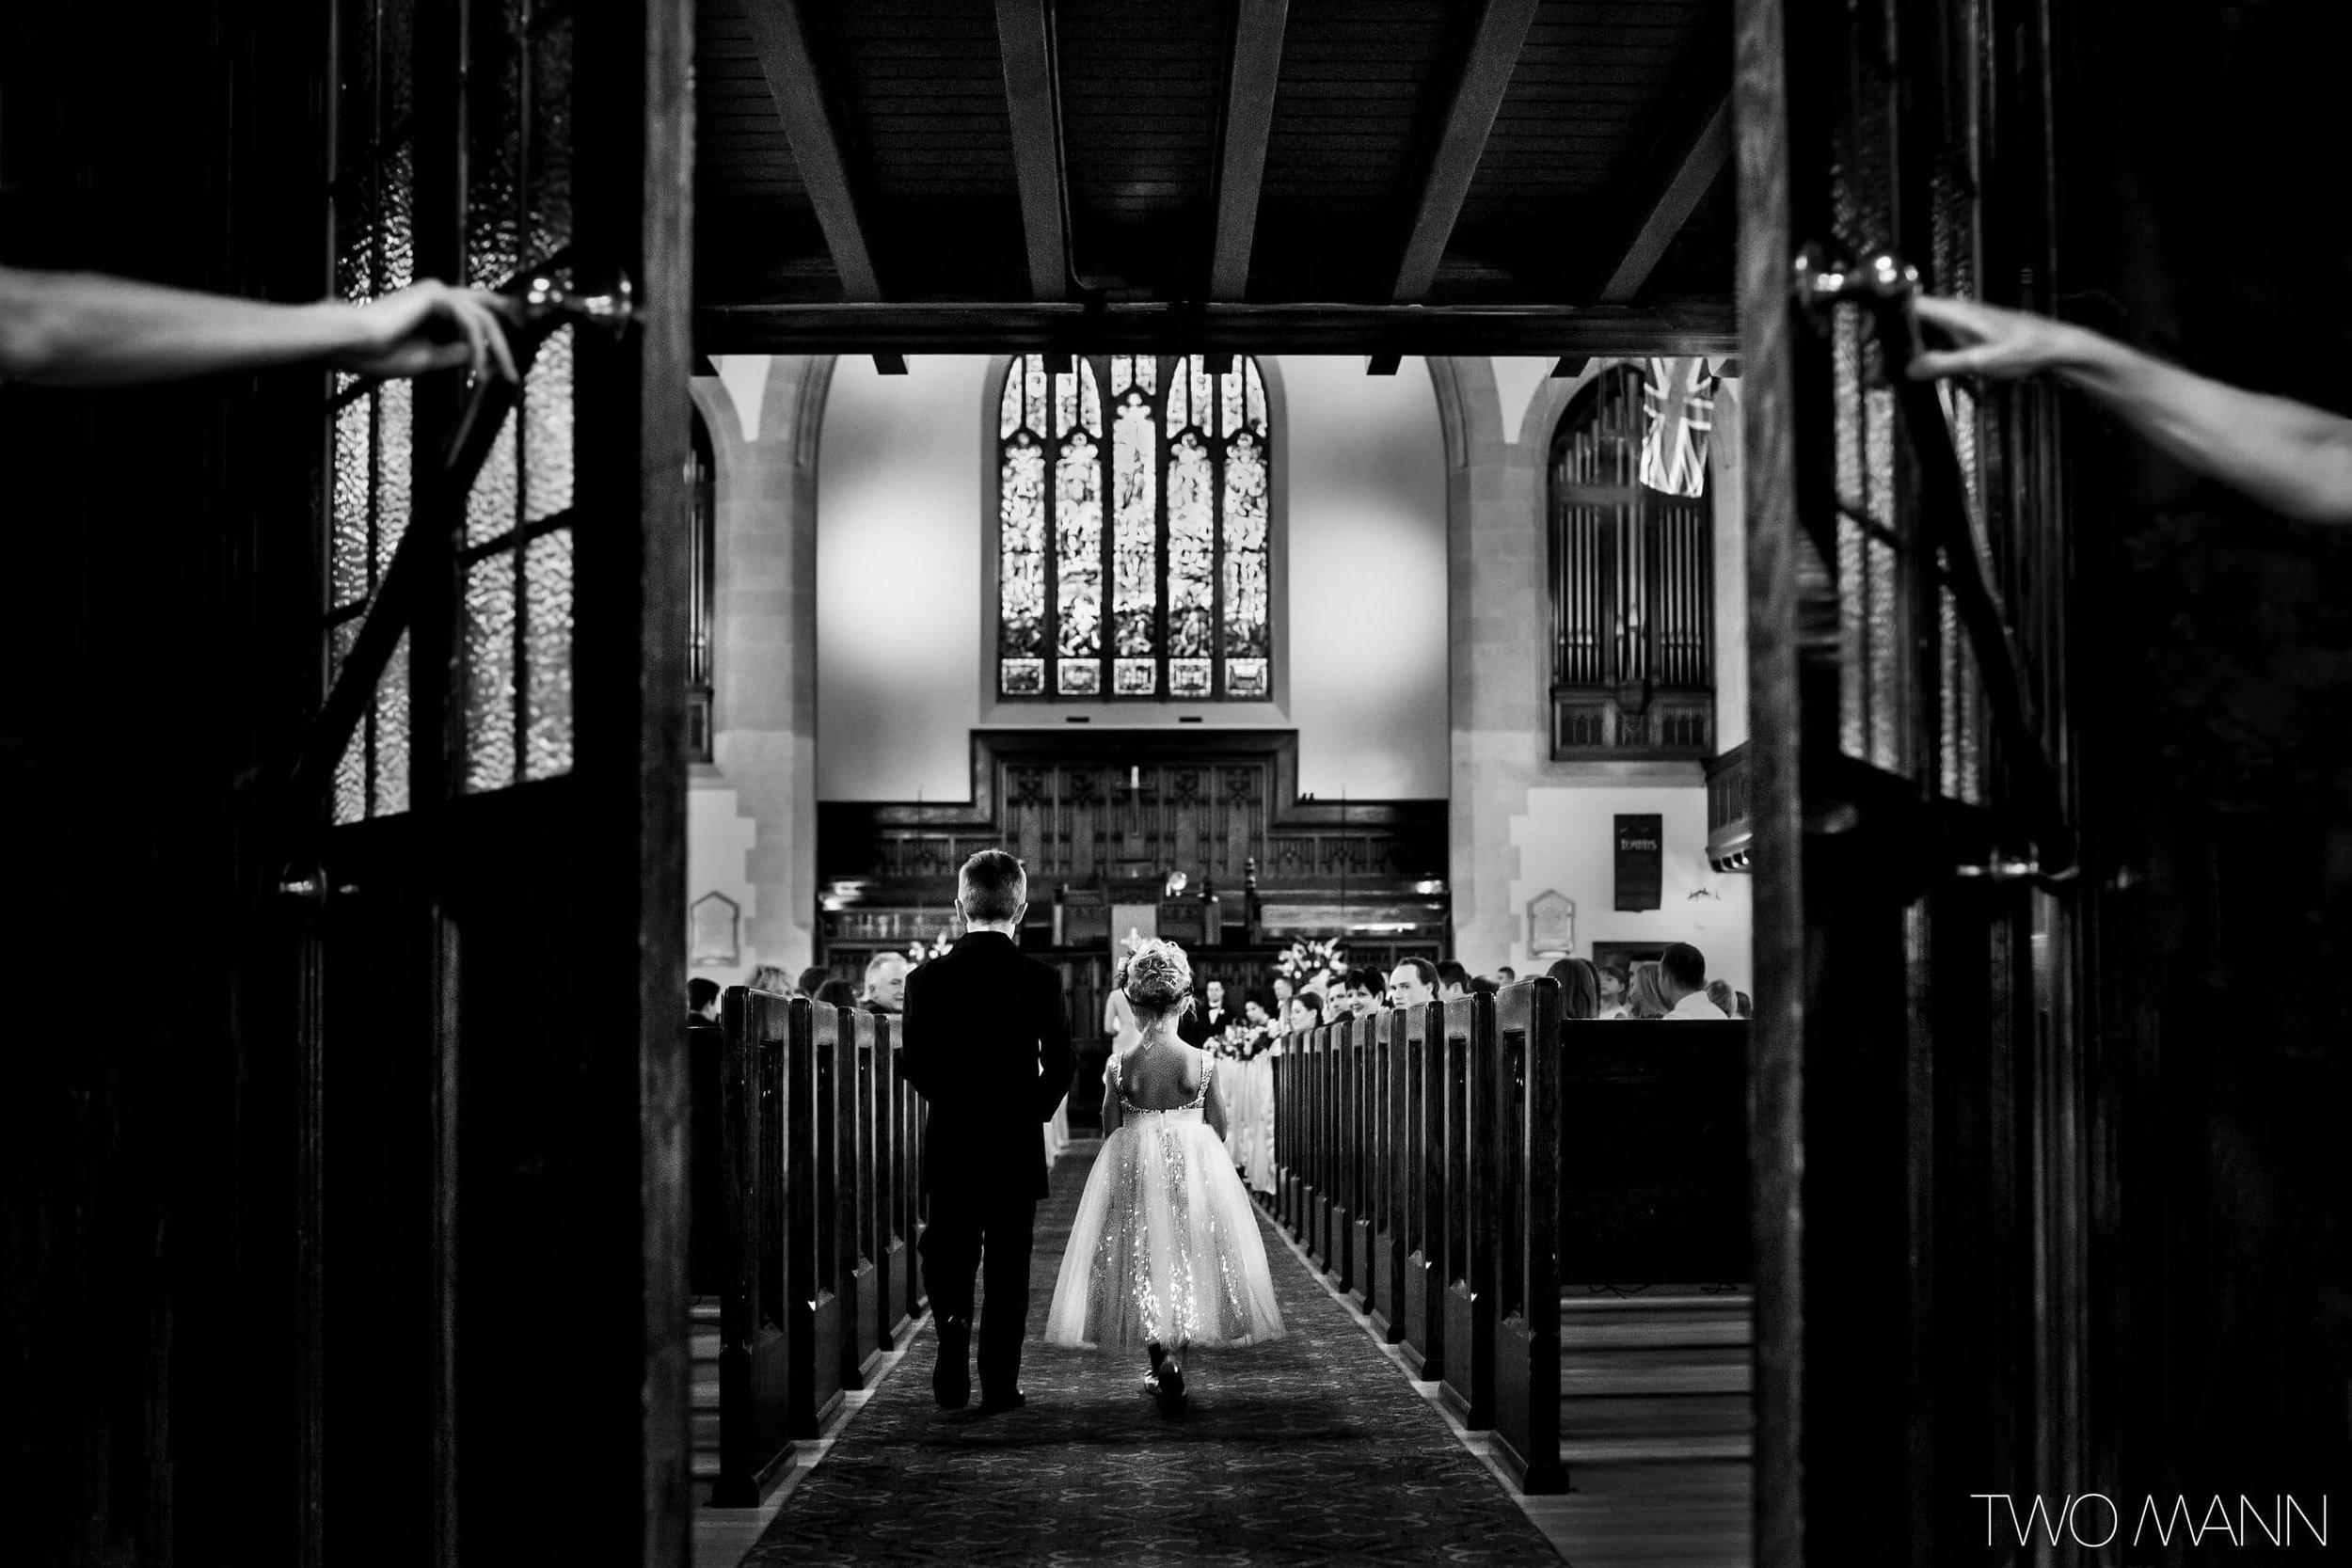 Two-Mann-Studios-Worlds-Best-Wedding-Photography-Best-of-2016-075-2560x1707.jpg